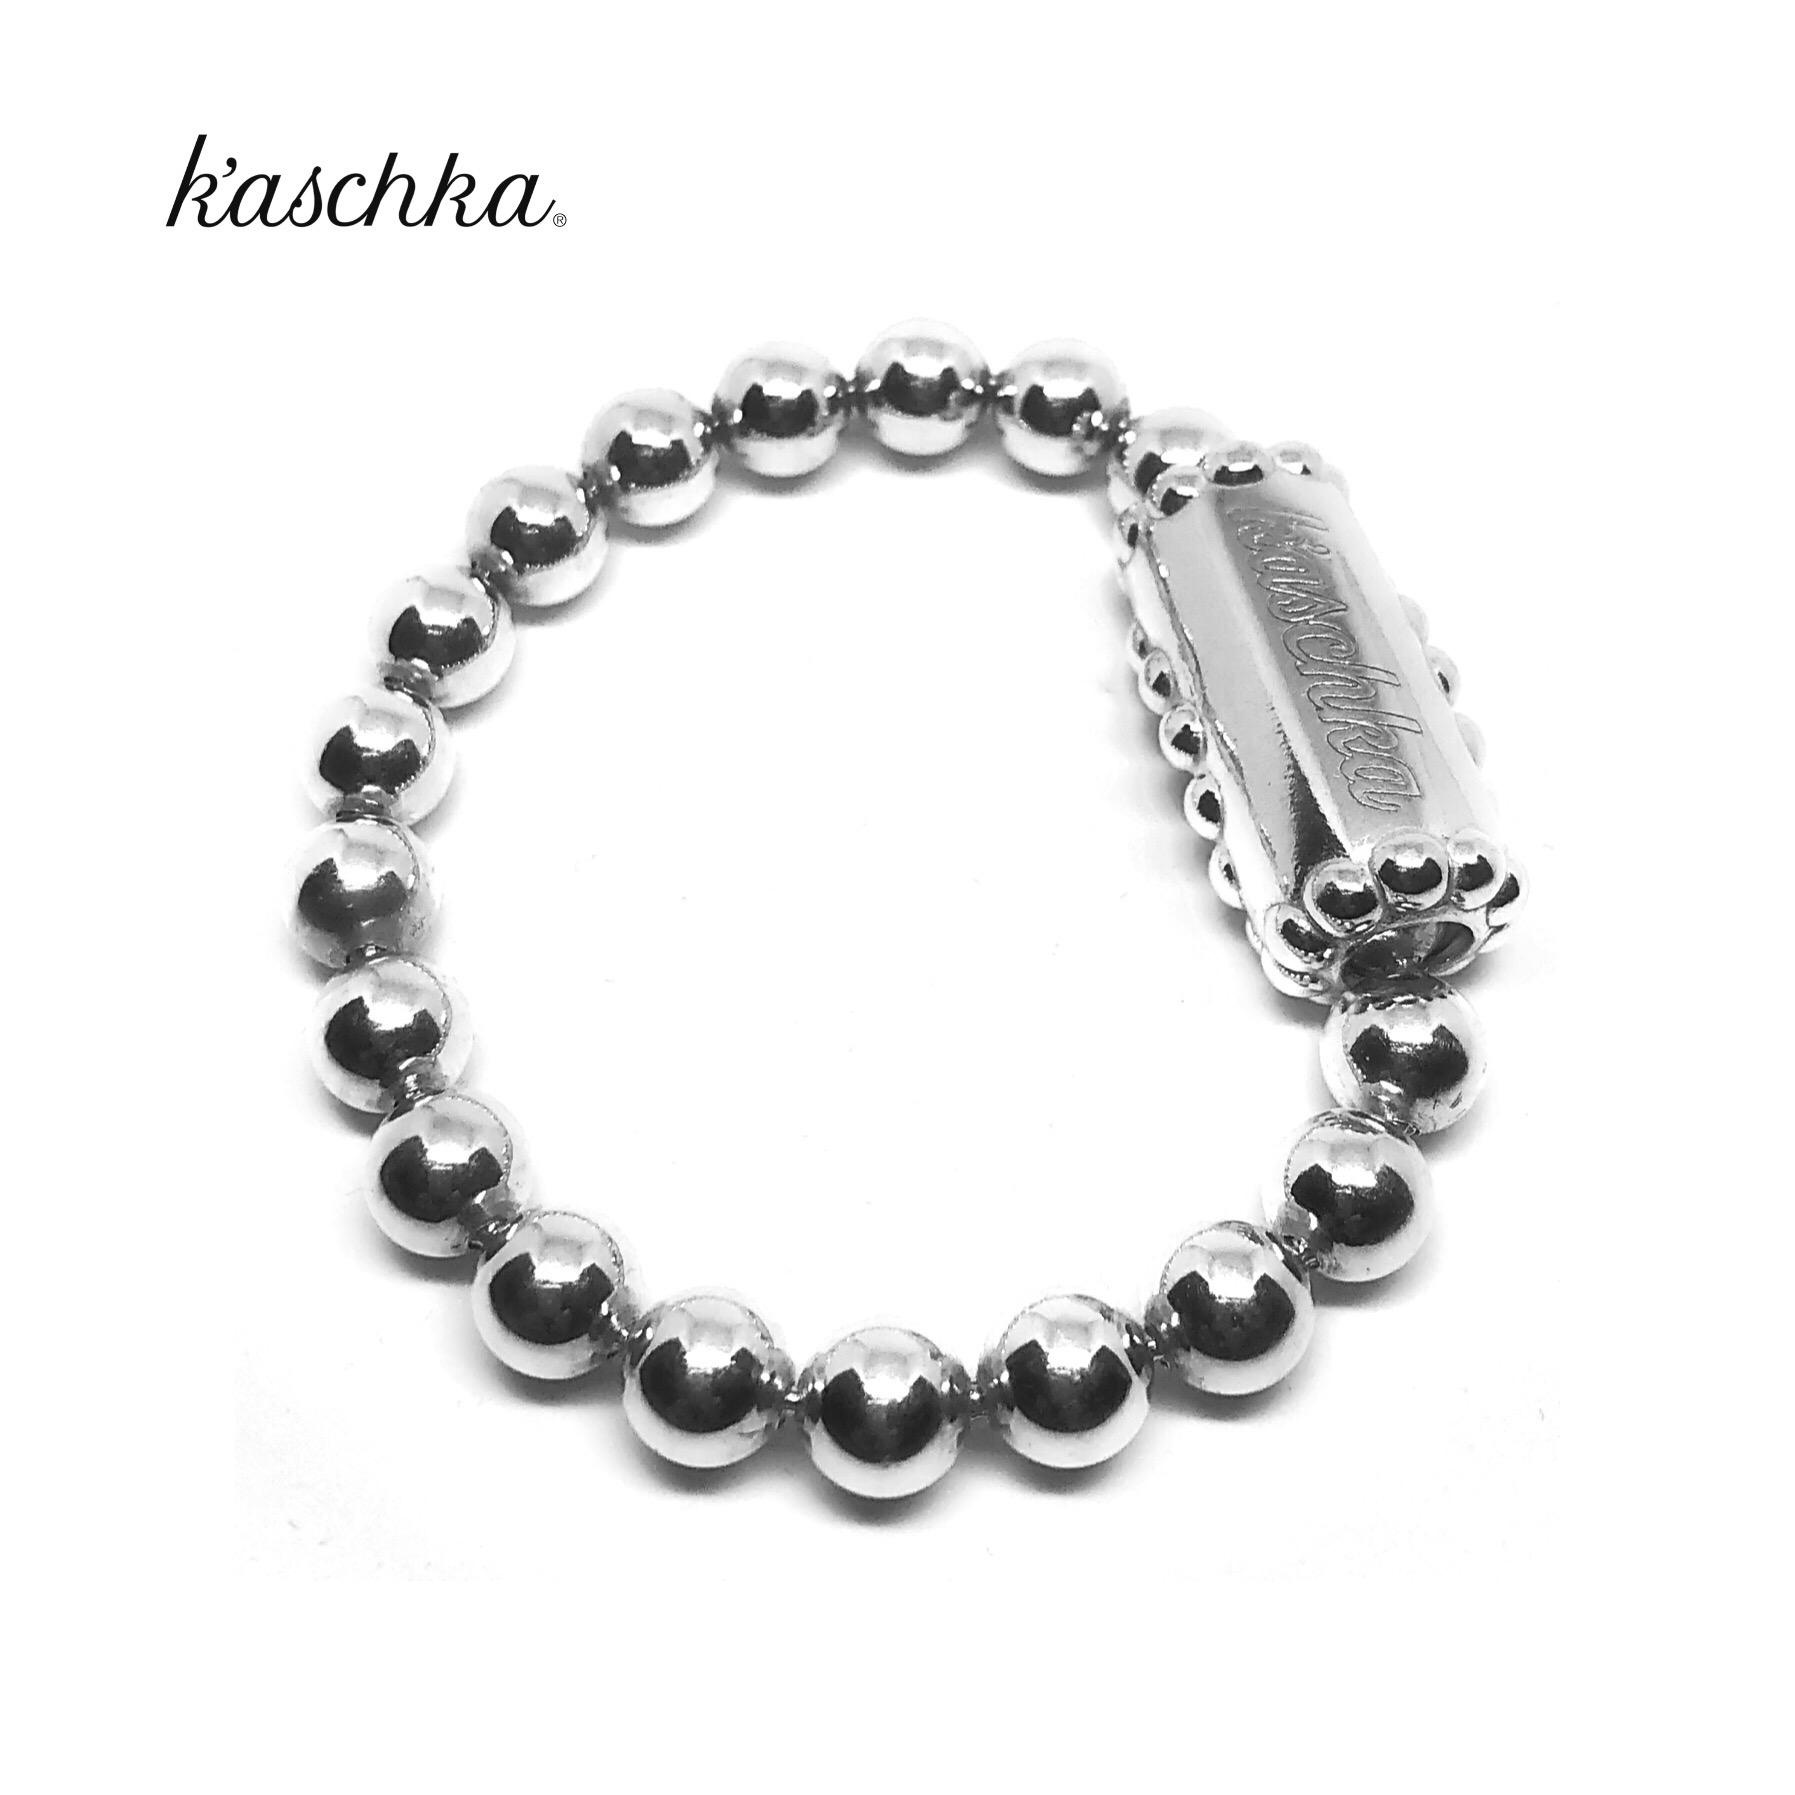 Massief 925 sterling zilver grote ballchain flex armband met sierslot